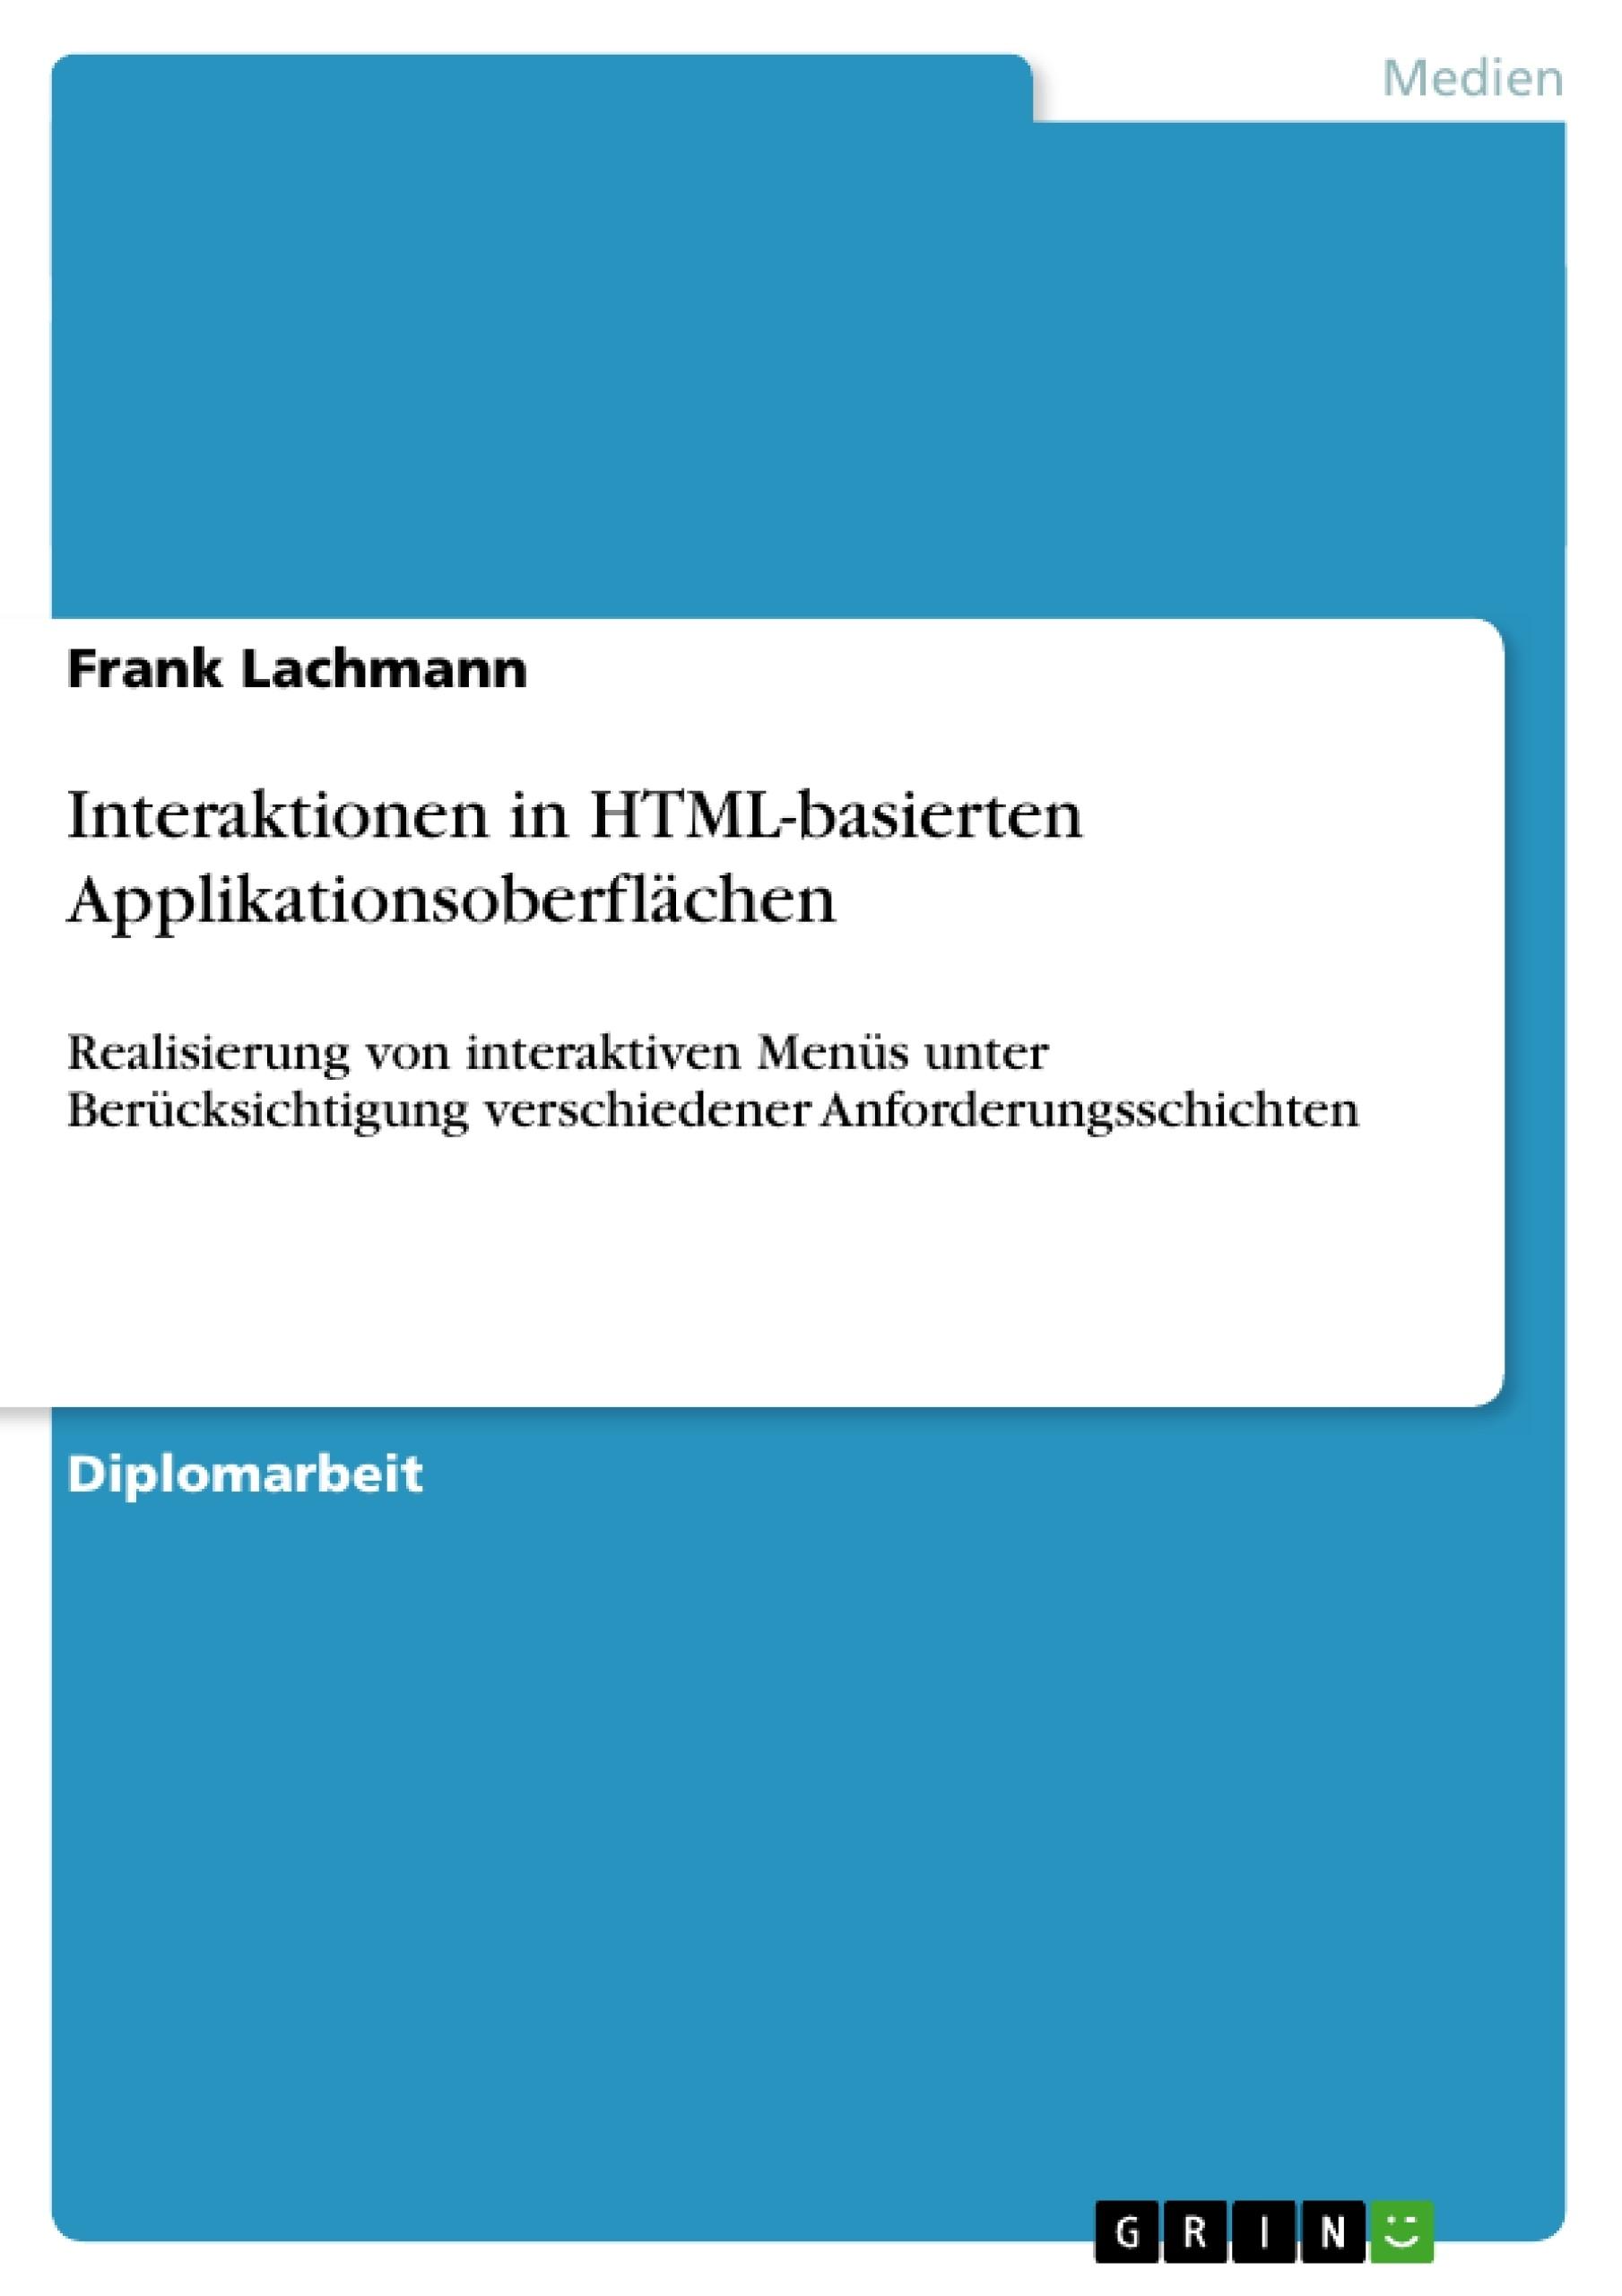 Titel: Interaktionen in HTML-basierten Applikationsoberflächen